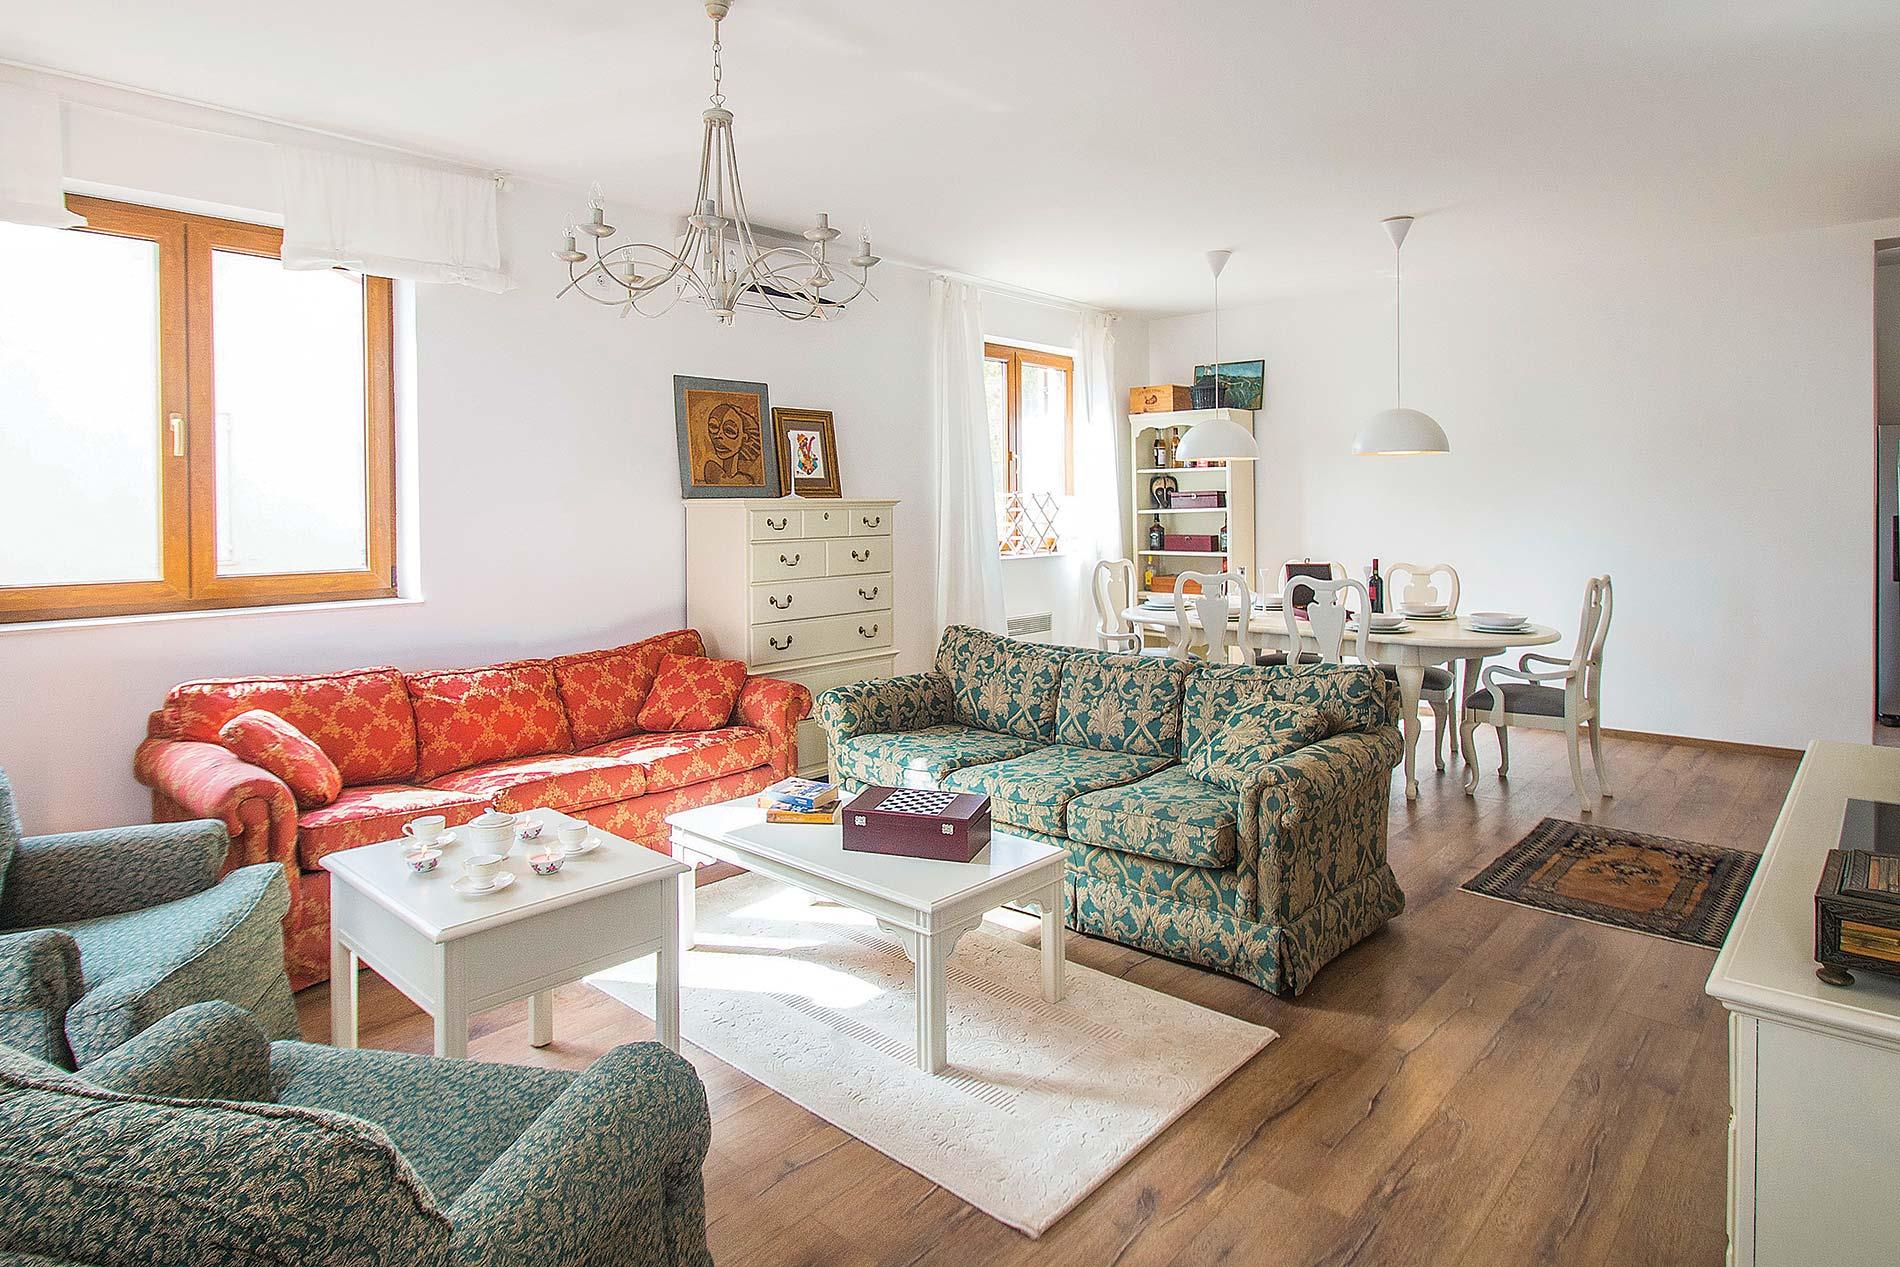 Villa La Beata in Labin - sleeps 10 people